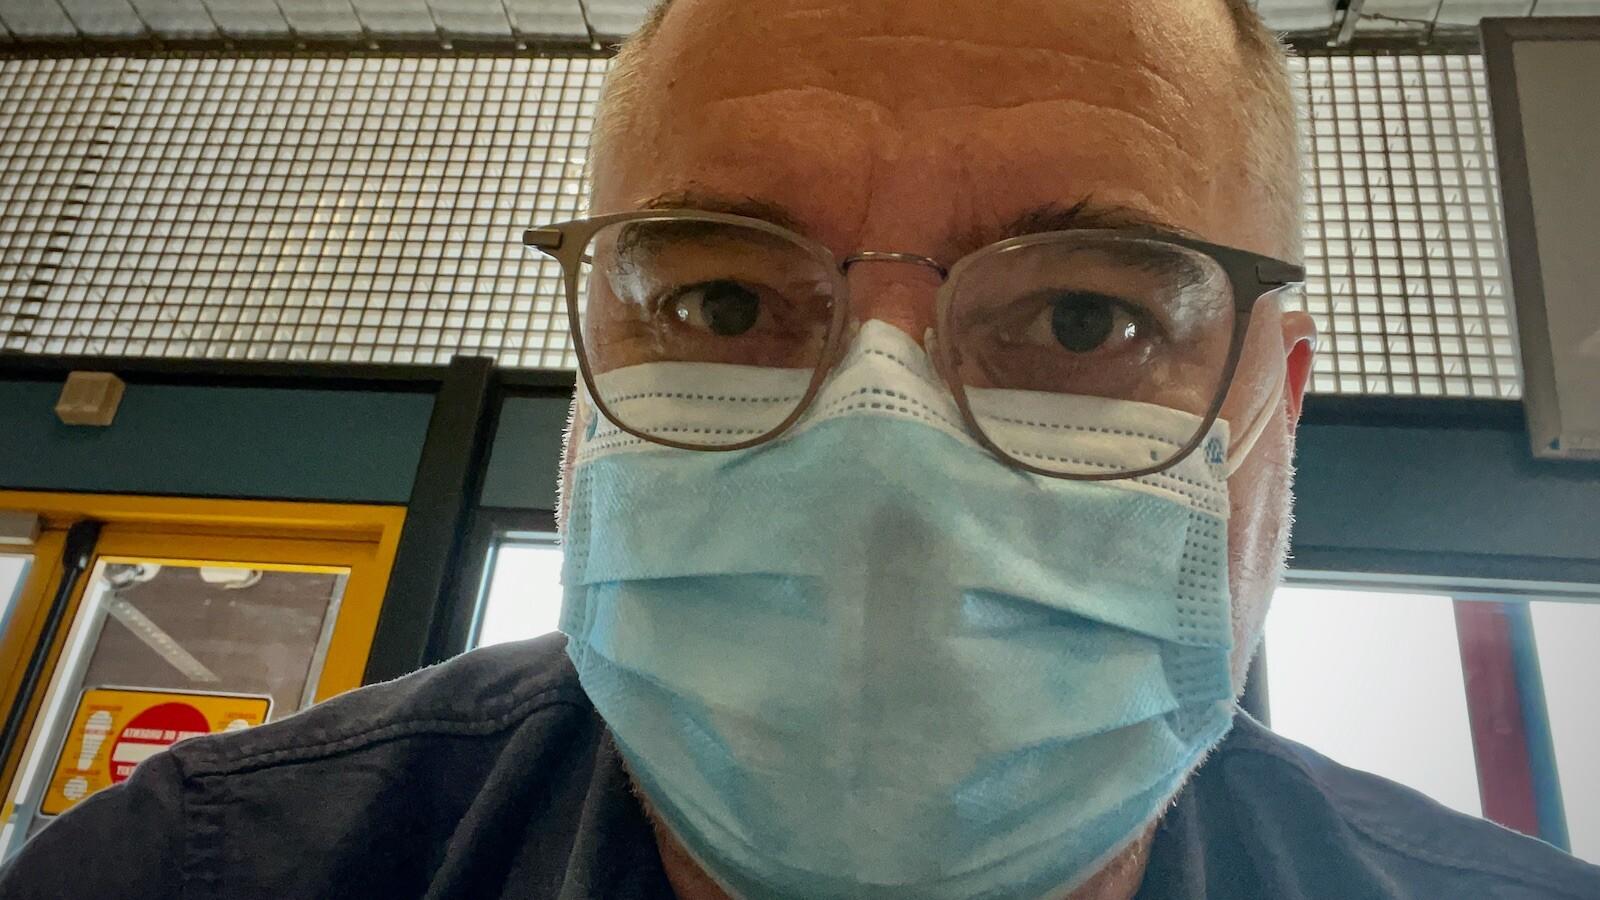 Reisen Fliegen Pandemie Corona Covid-19 Sars-CoV-2